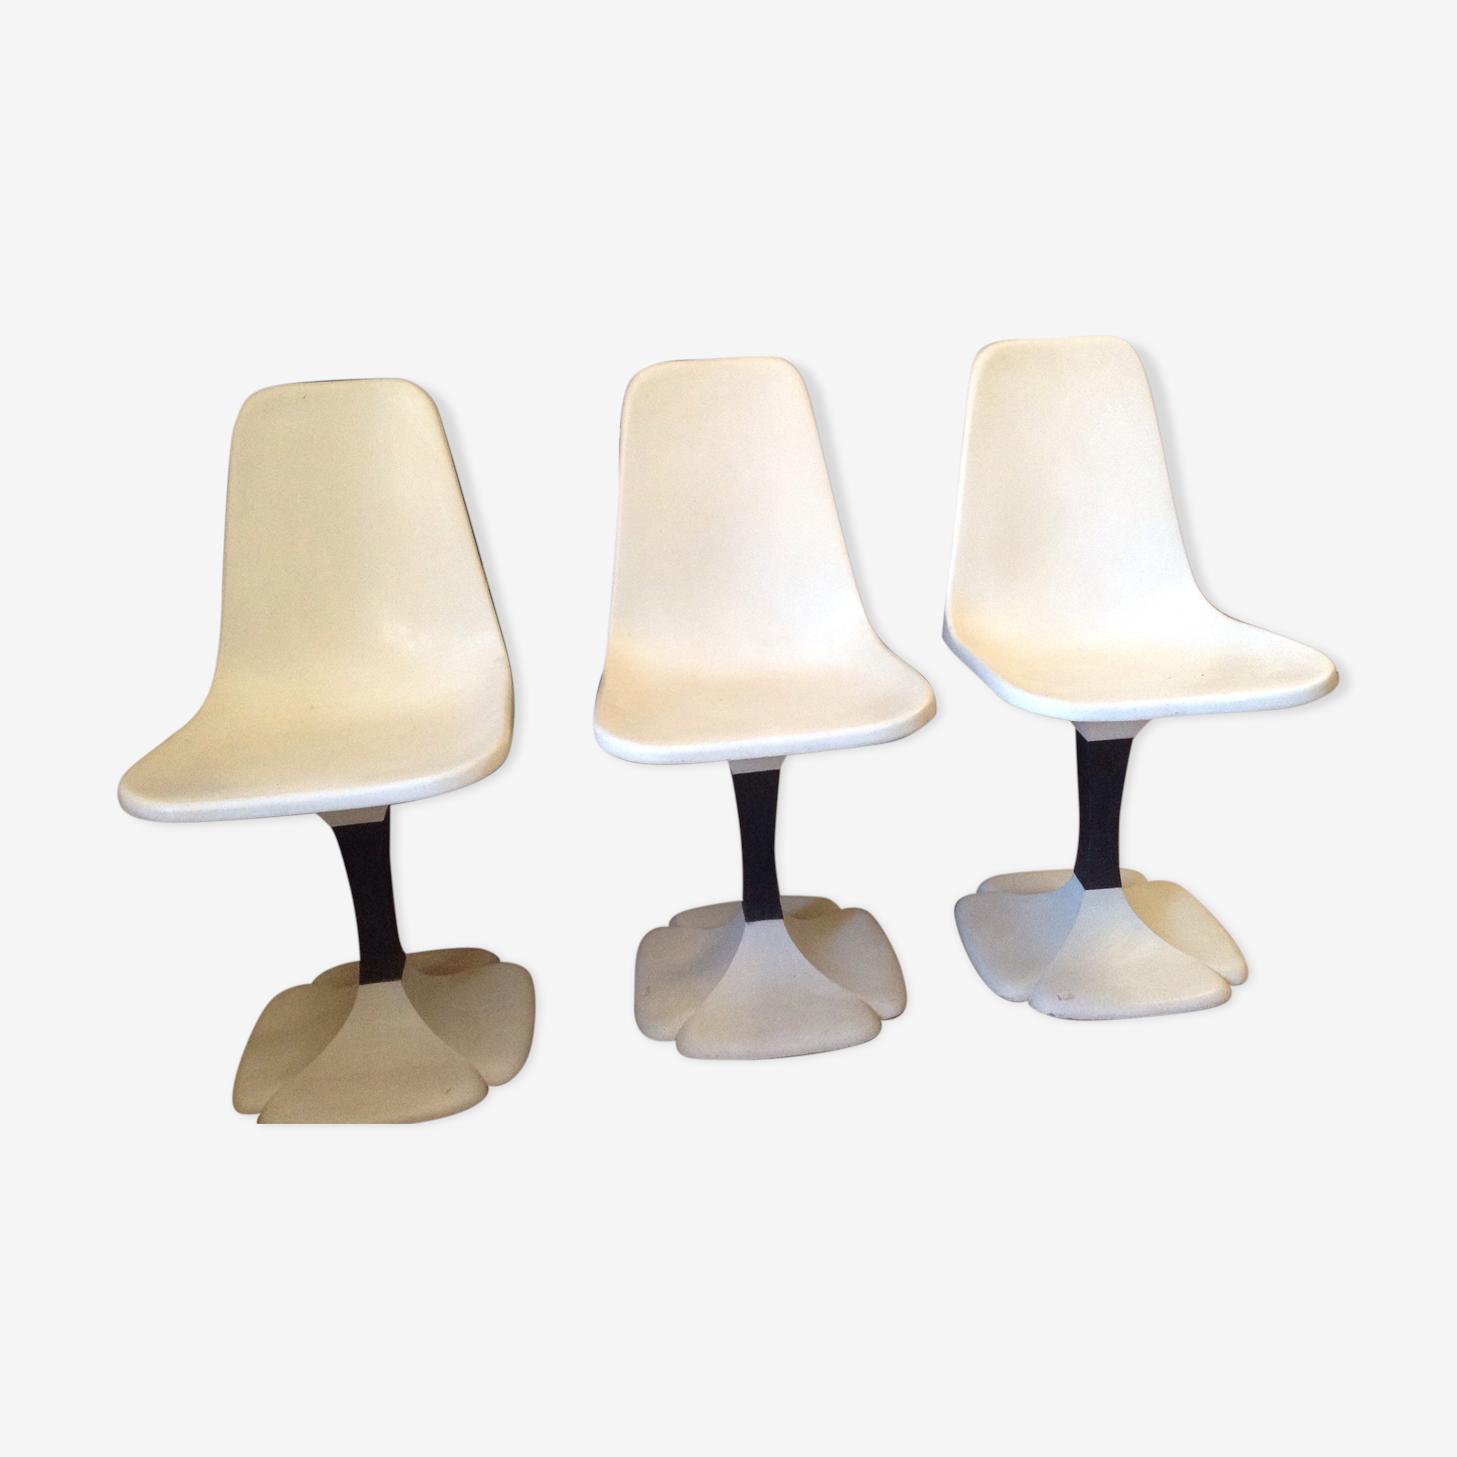 3 Gautier white chairs